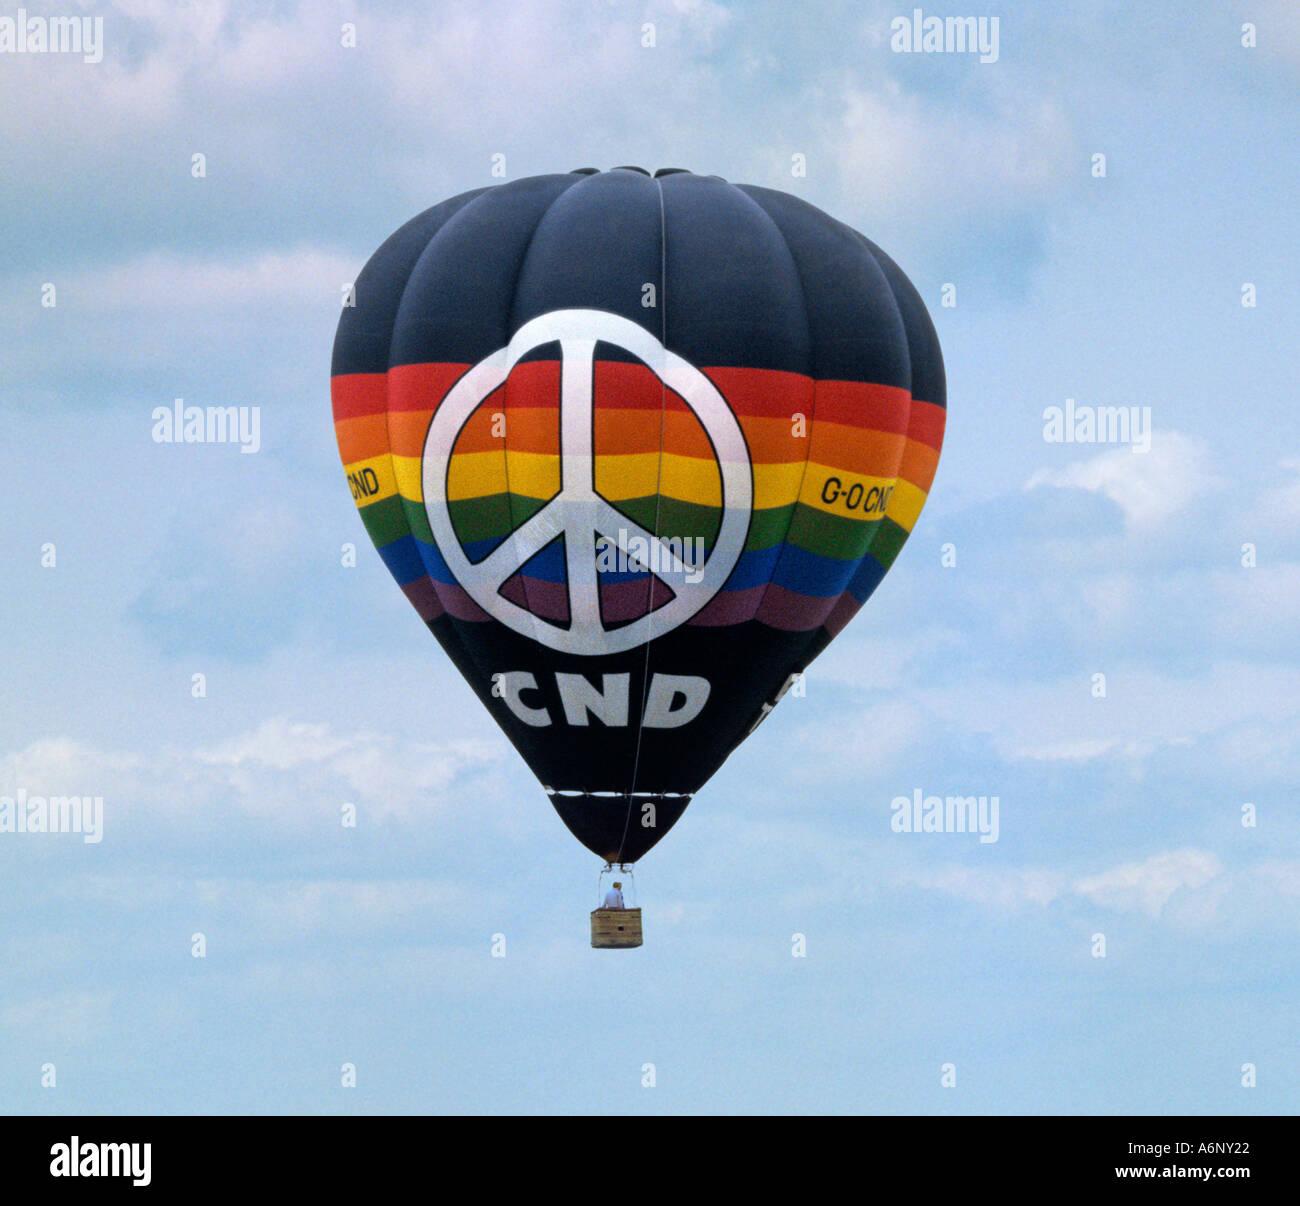 Ballon à la CND CND rally Photo Stock